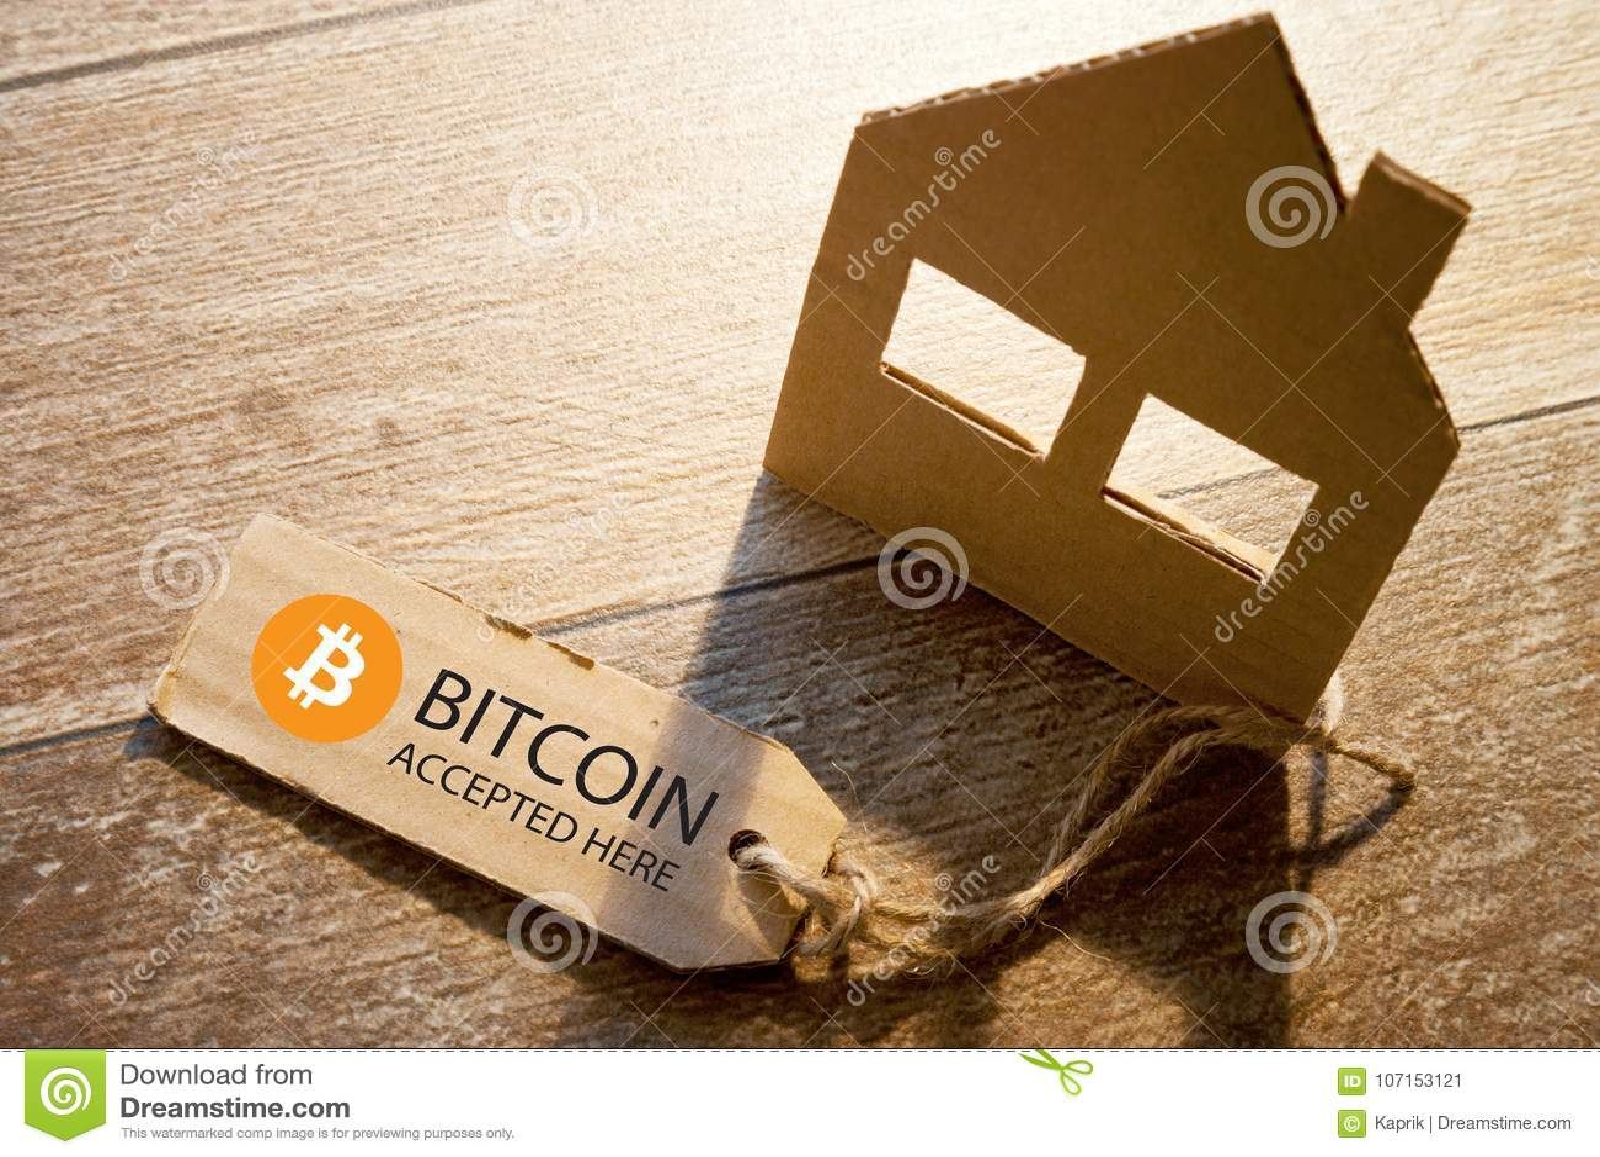 Cryptocurrency virtual de Bitcoin do dinheiro - Bitcoins aceitado aqui